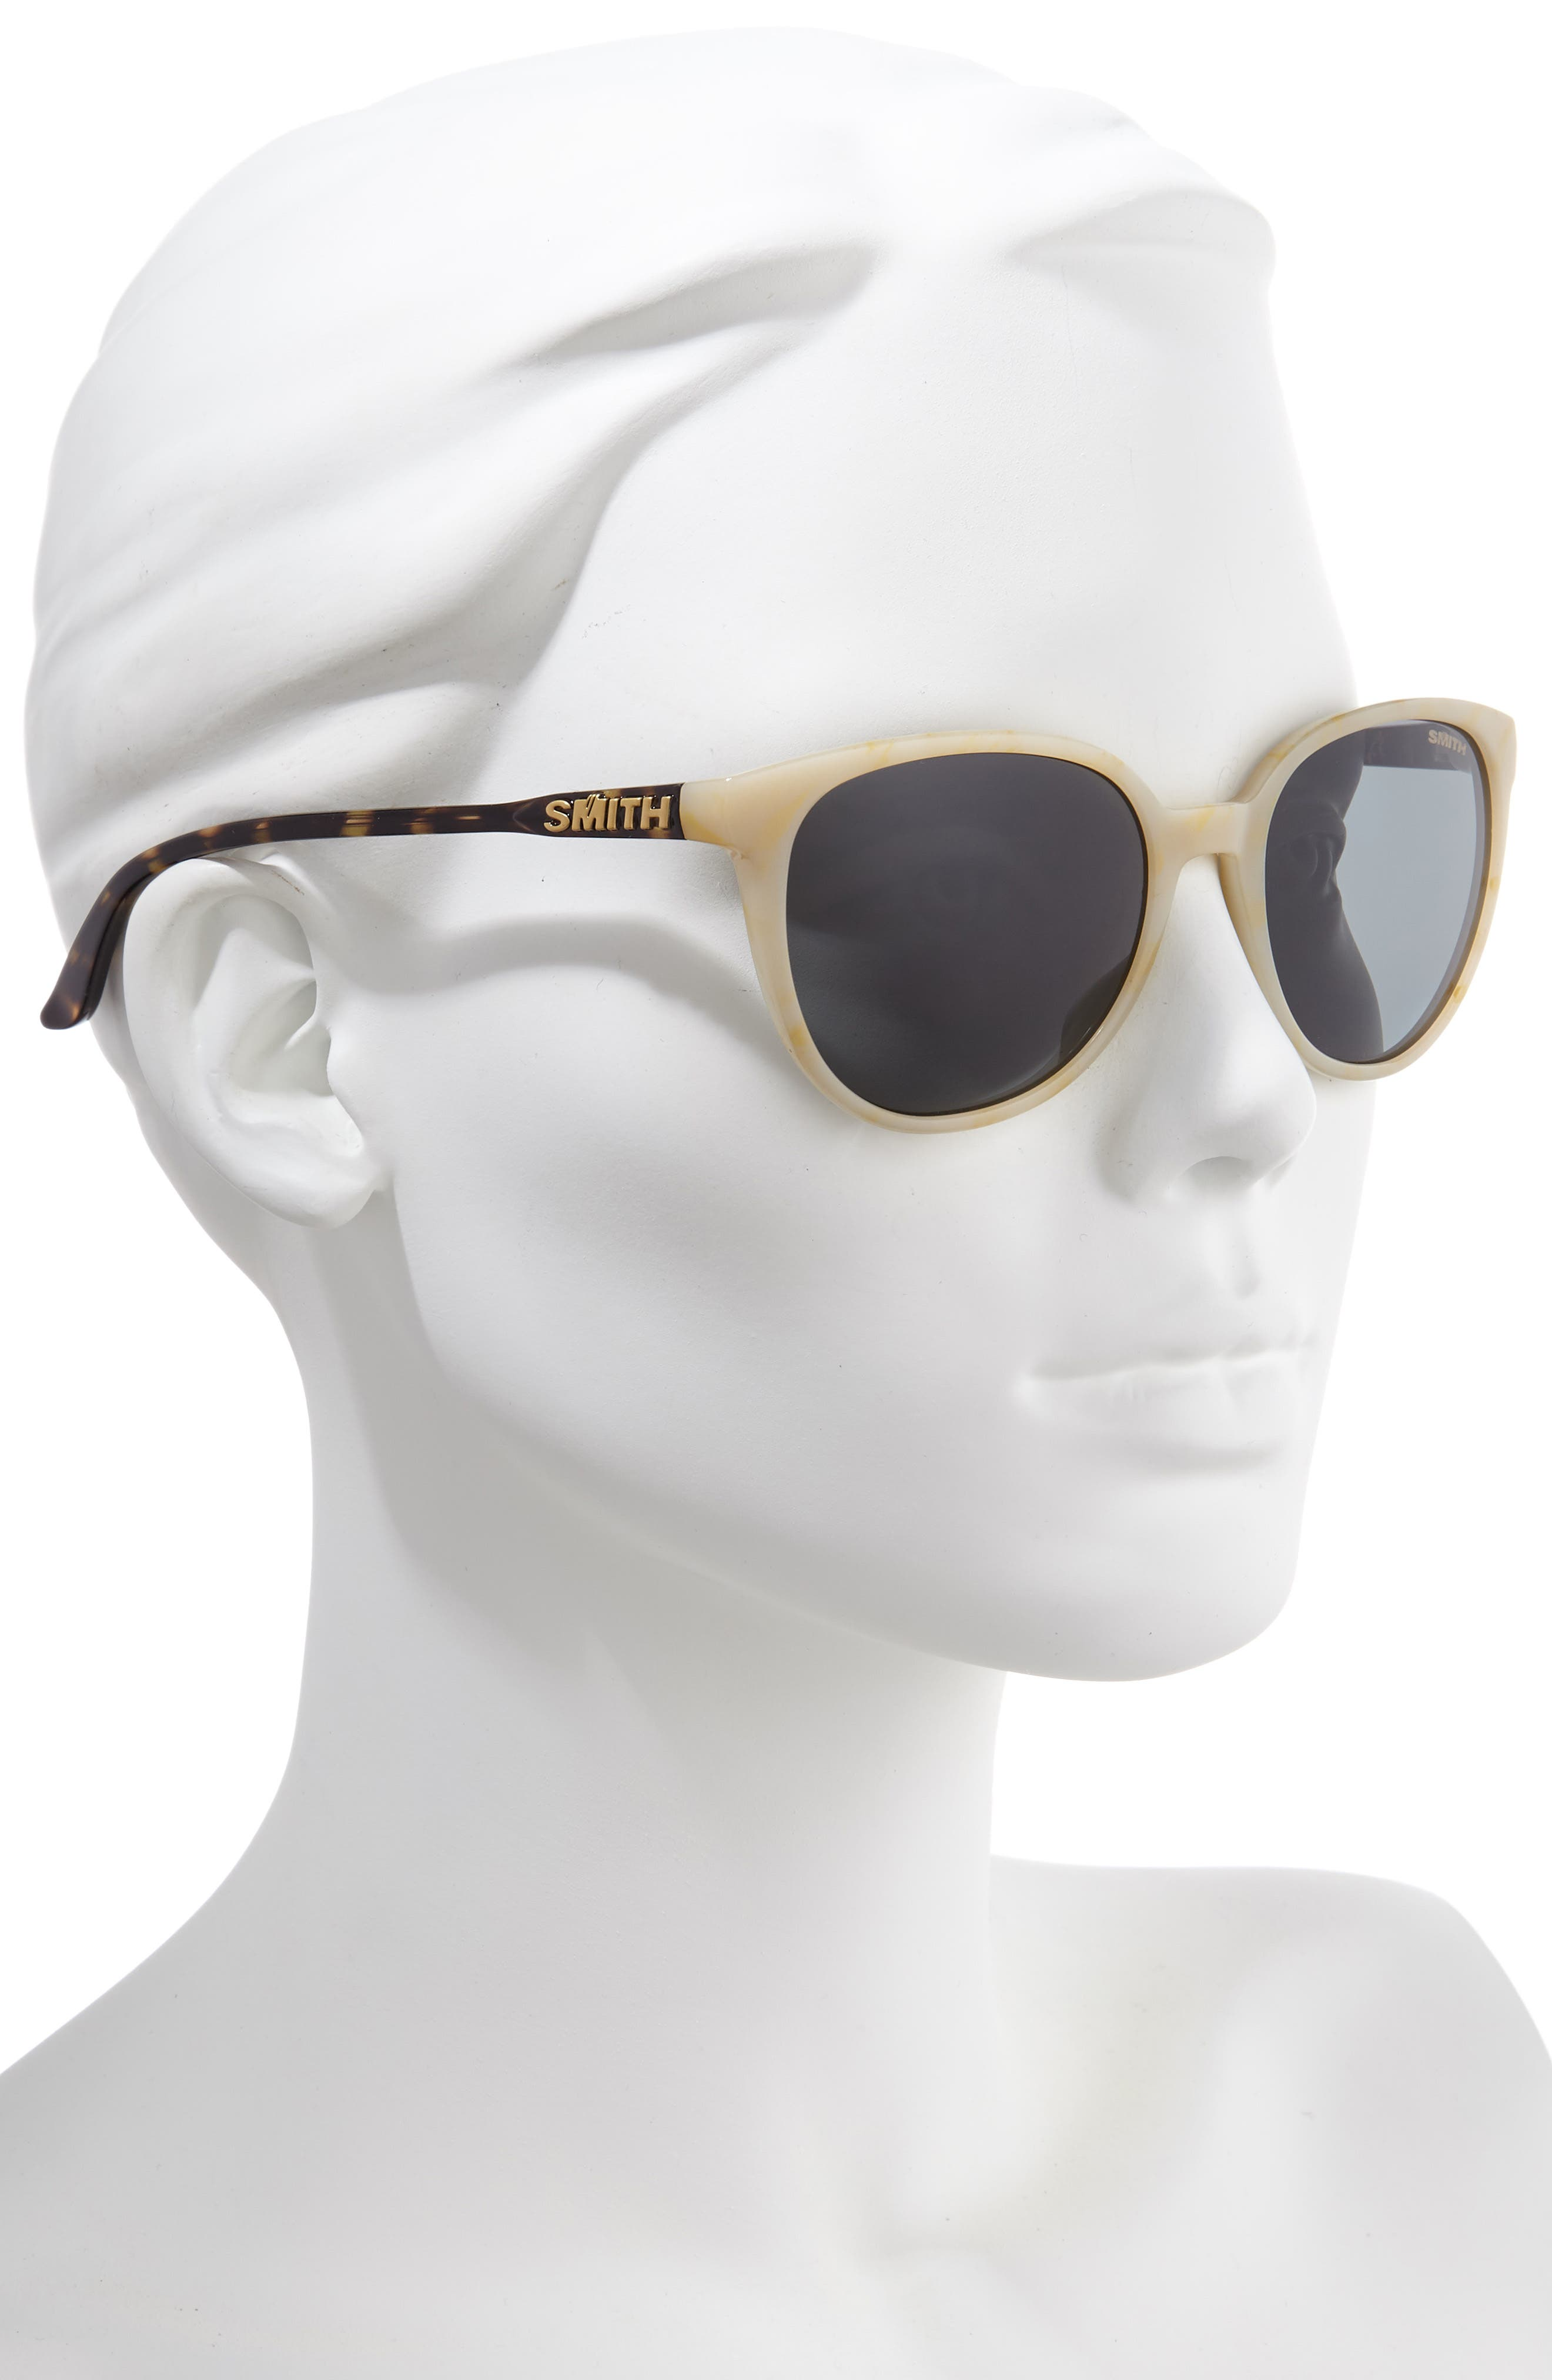 SMITH, Cheetah 54mm ChromaPop<sup>™</sup> Polarized Round Sunglasses, Alternate thumbnail 2, color, IVORY TORTOISE